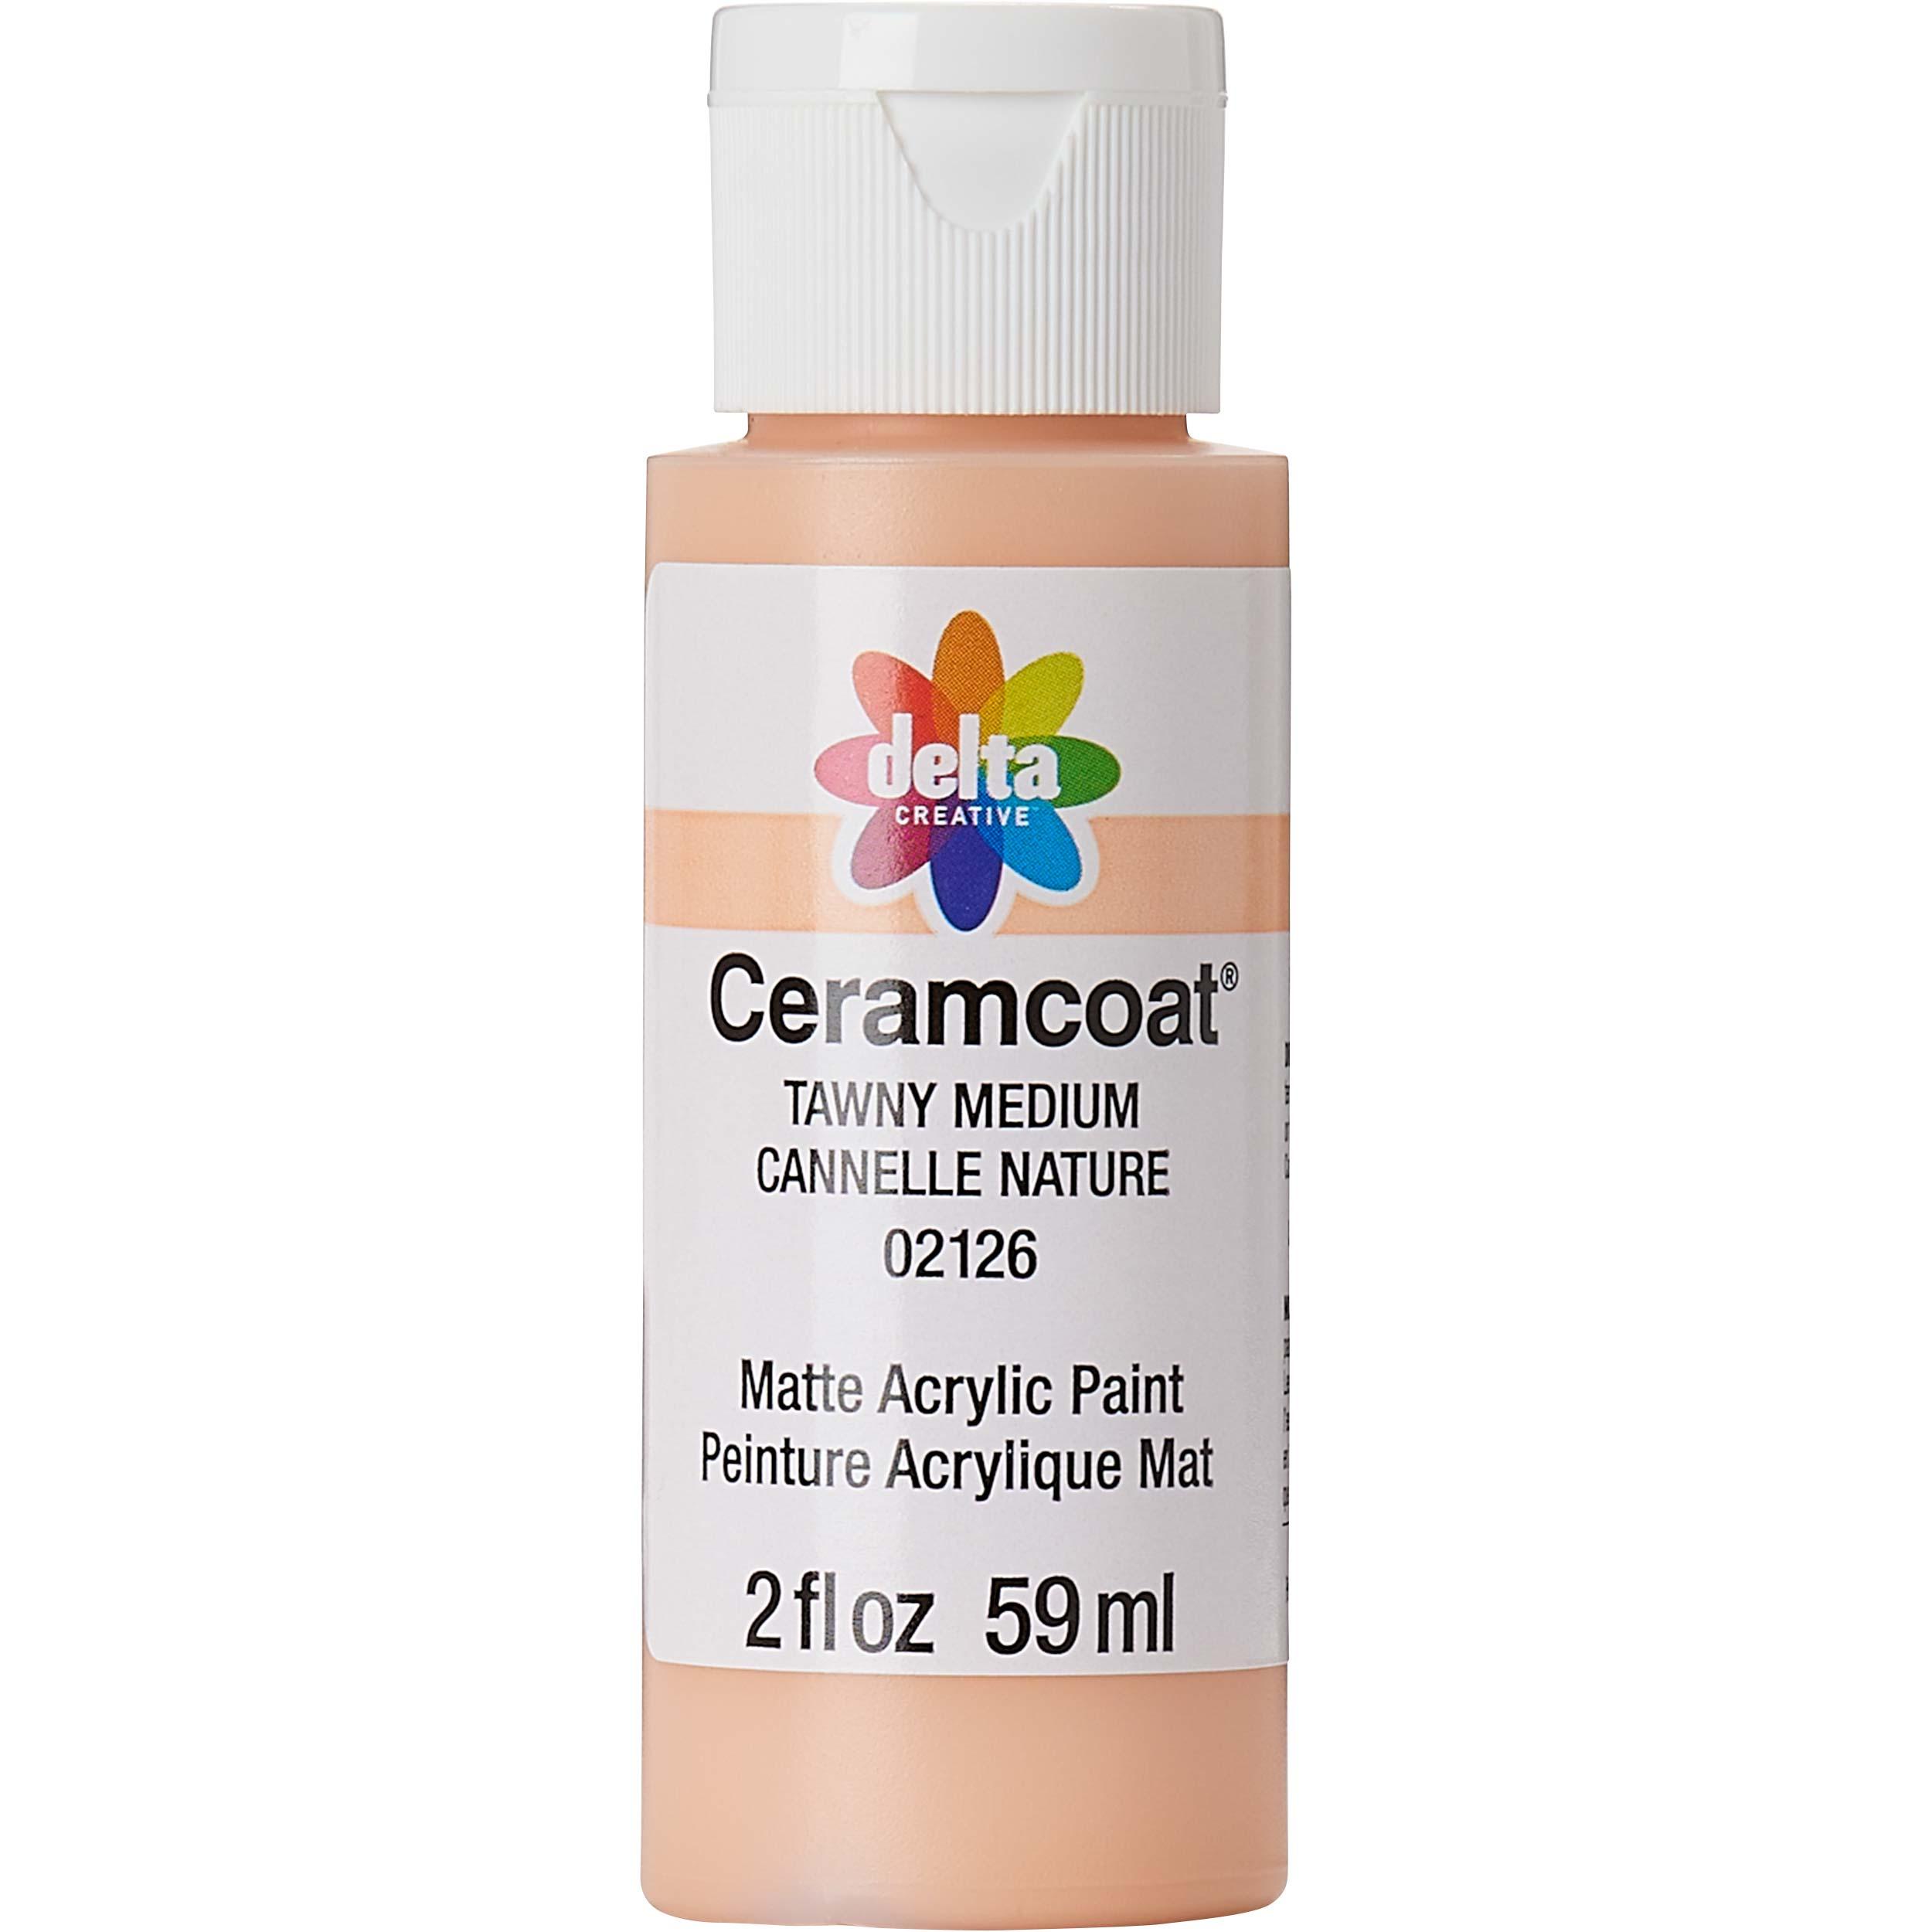 Delta Ceramcoat ® Acrylic Paint - Tawny Medium, 2 oz.